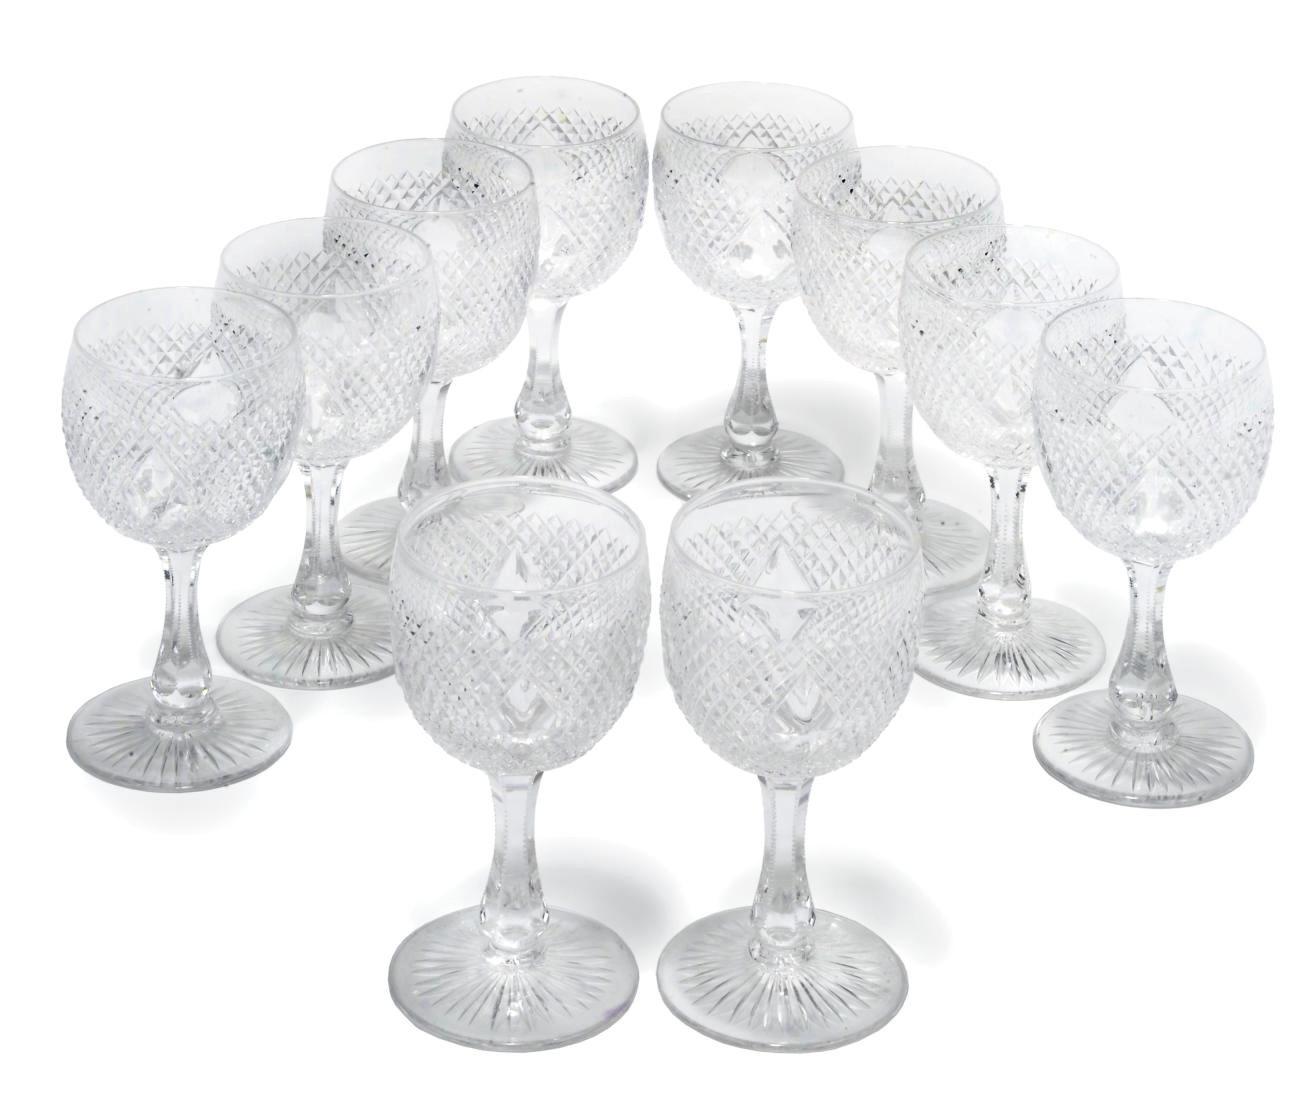 A SET OF TEN CUT-GLASS WINE-GL